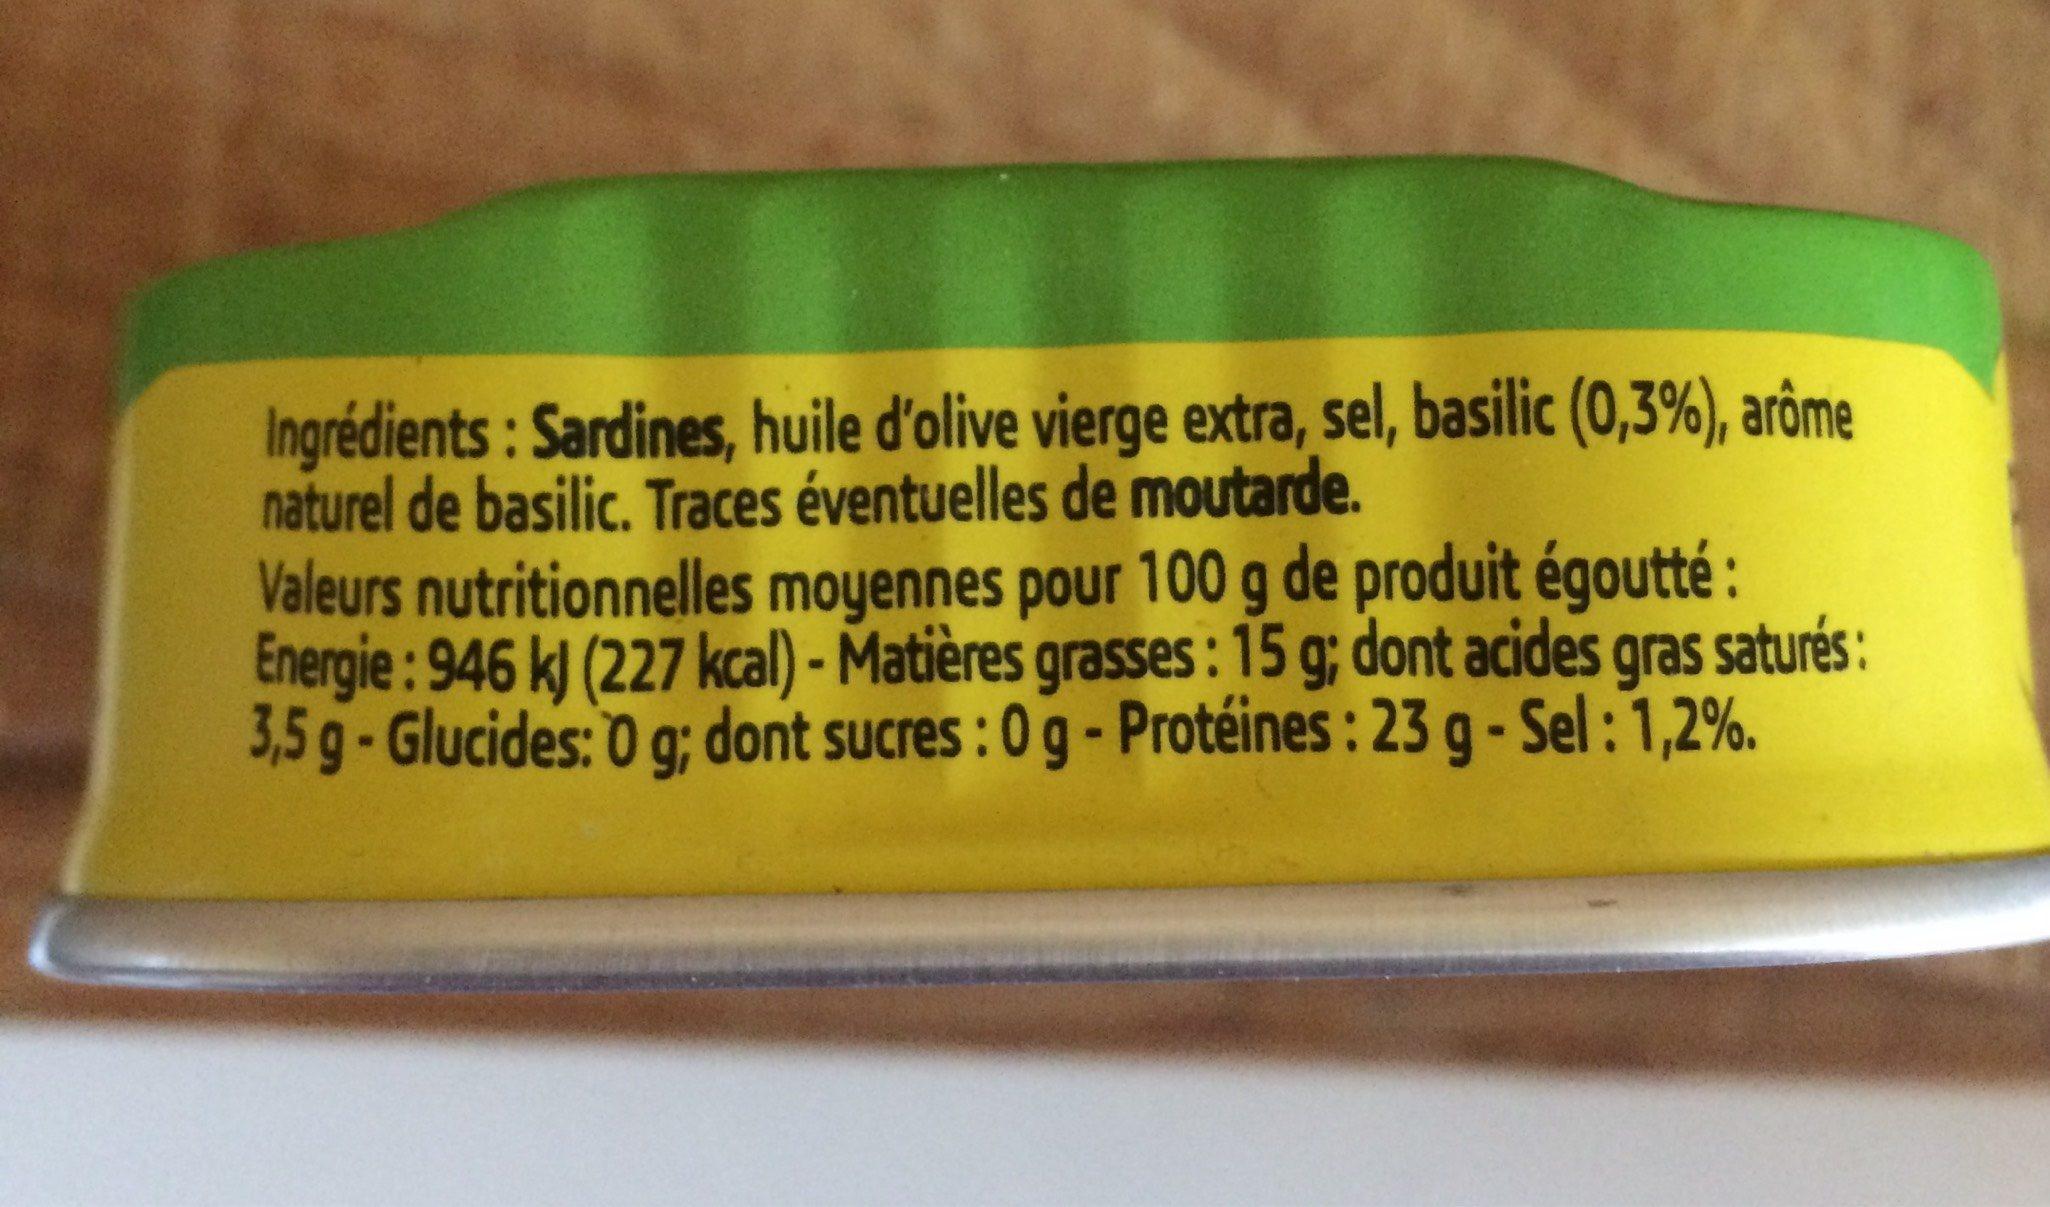 Sardines Huile d'olive et basilic - Informations nutritionnelles